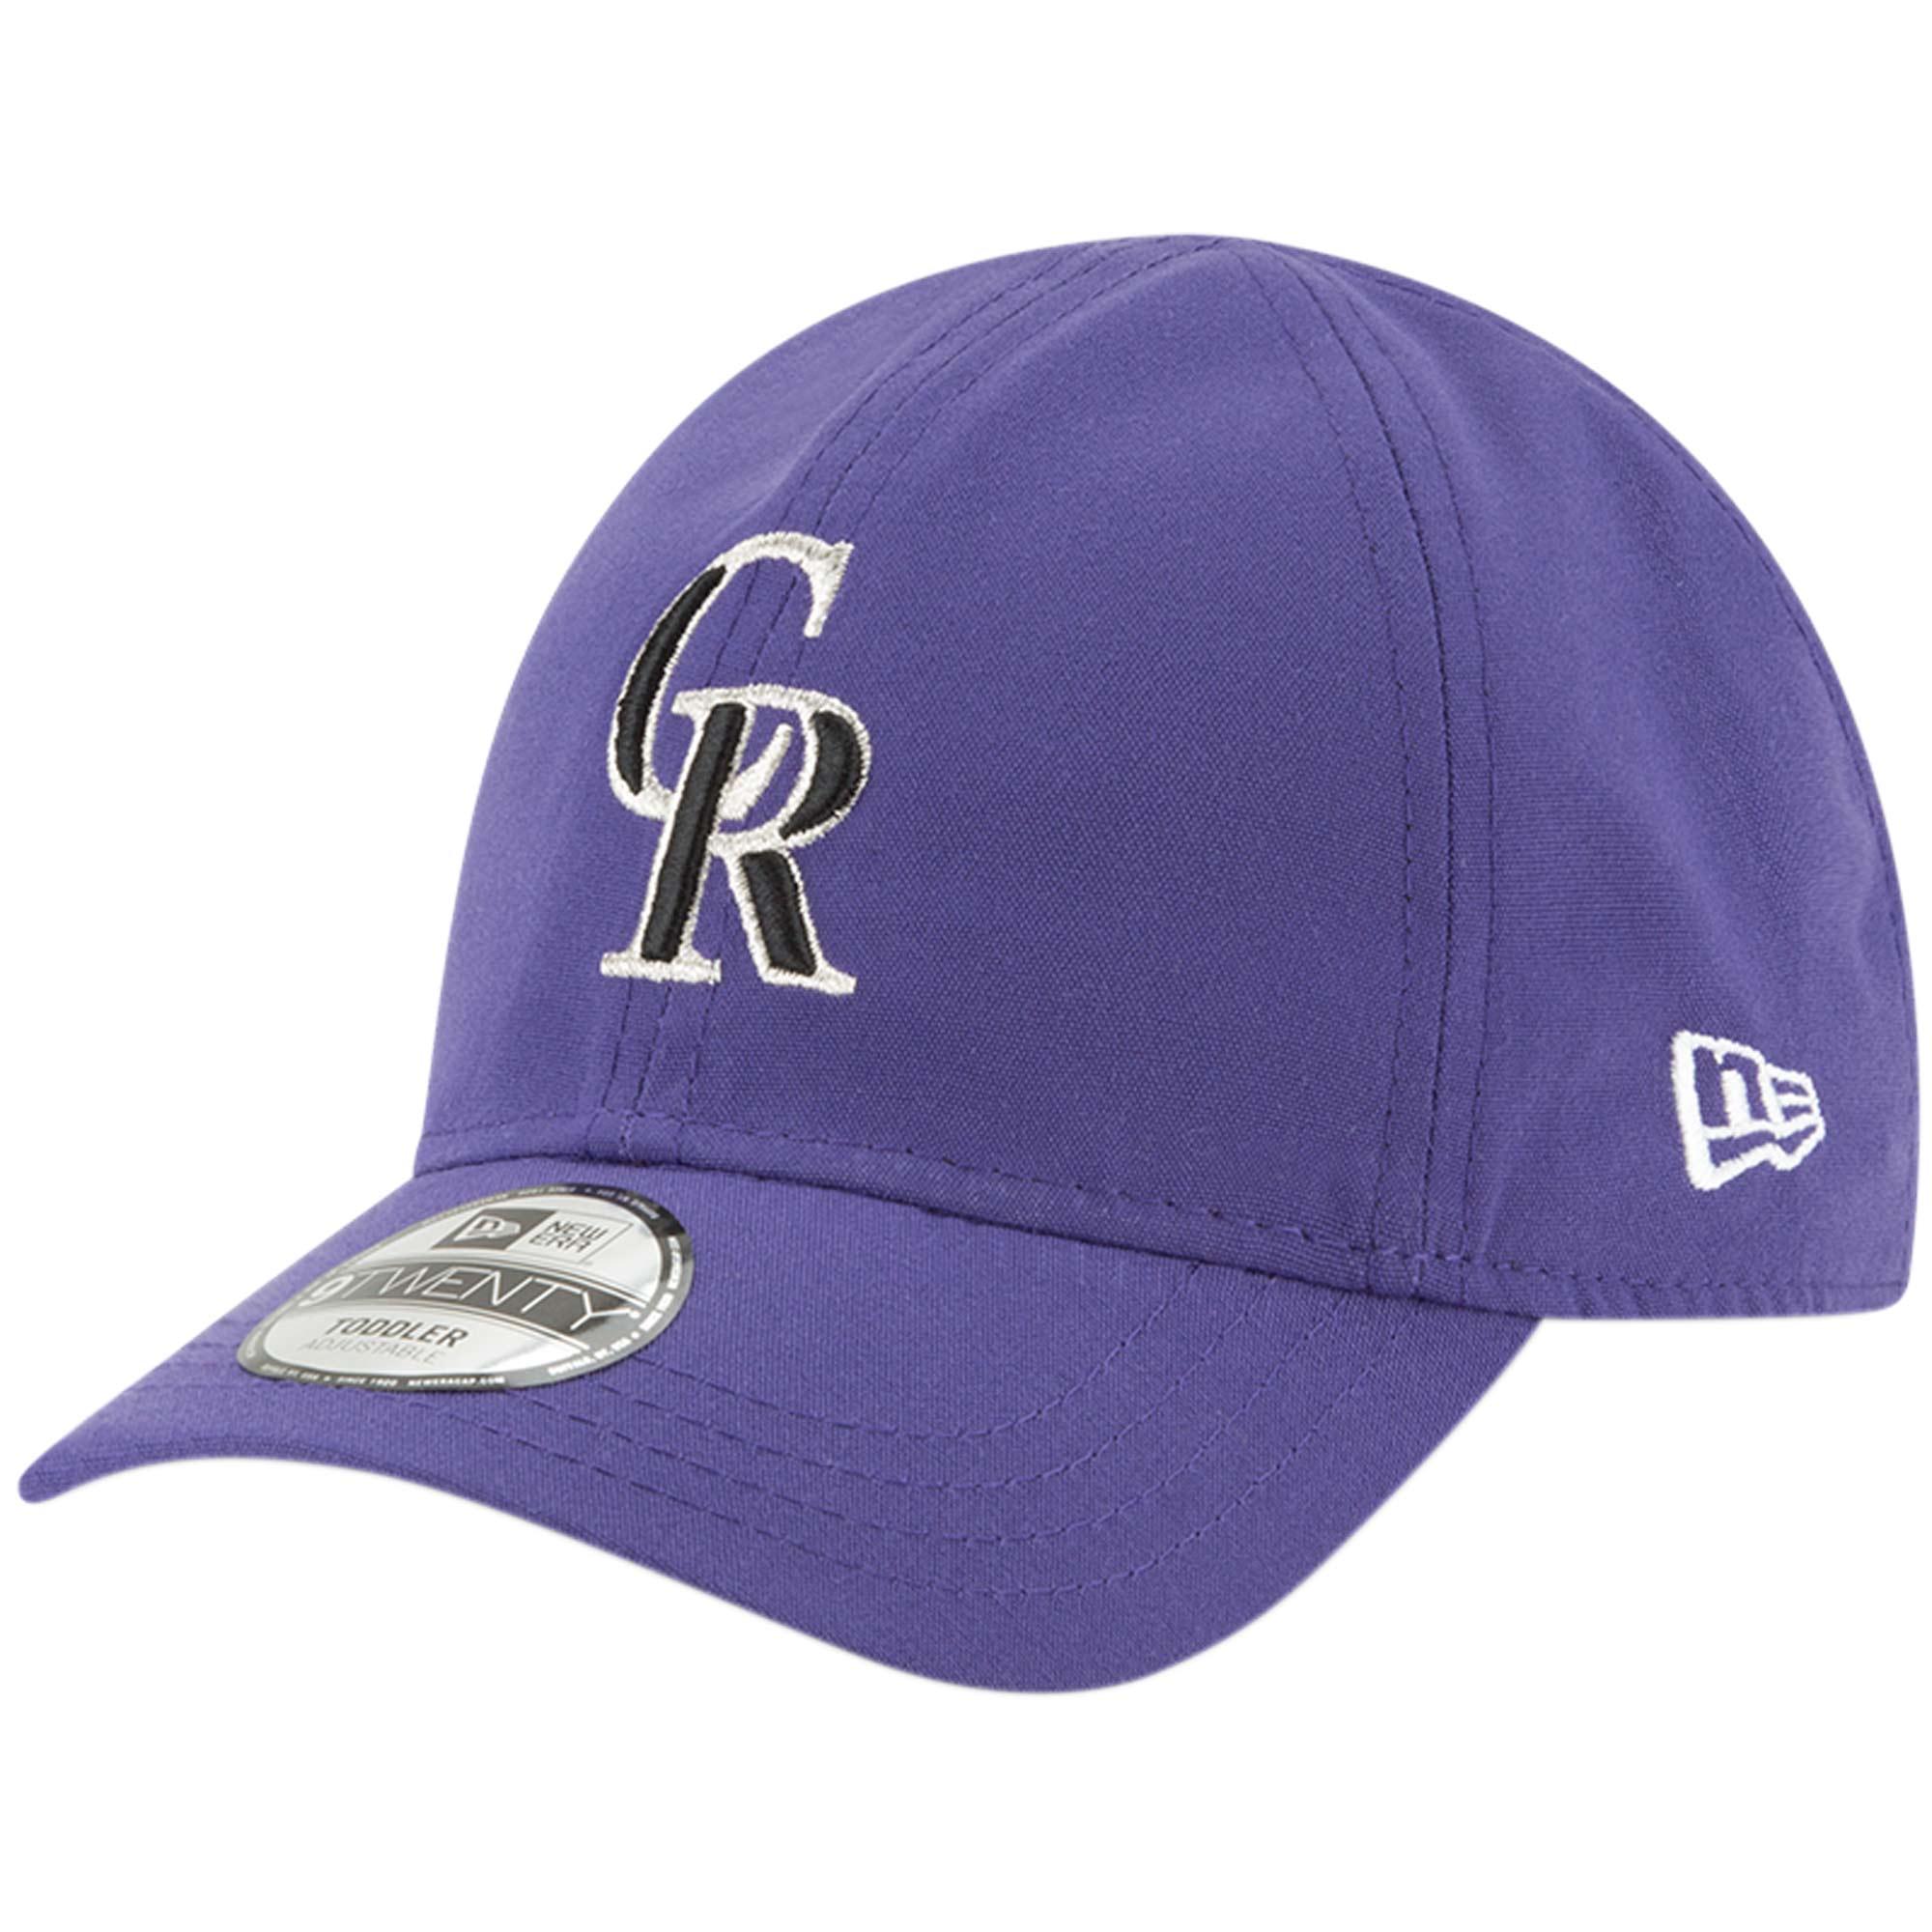 Colorado Rockies New Era Infant My 1st 9TWENTY Adjustable Hat - Purple - OSFA